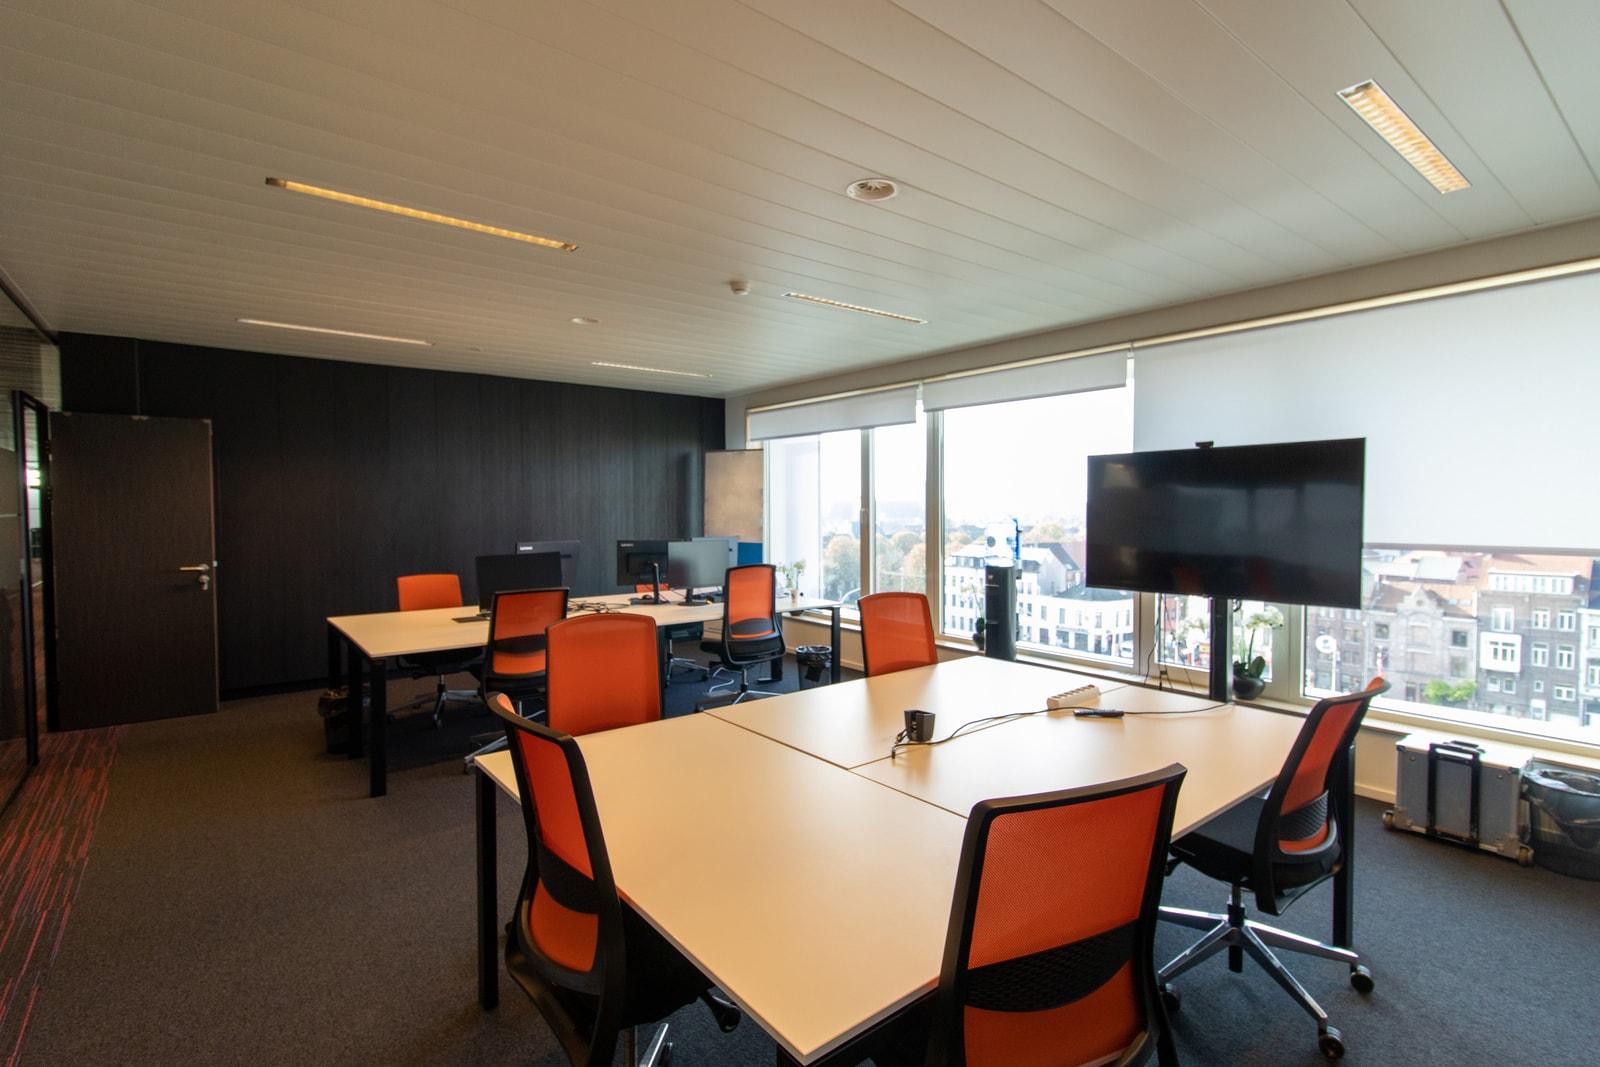 Verschillende kantoorunits